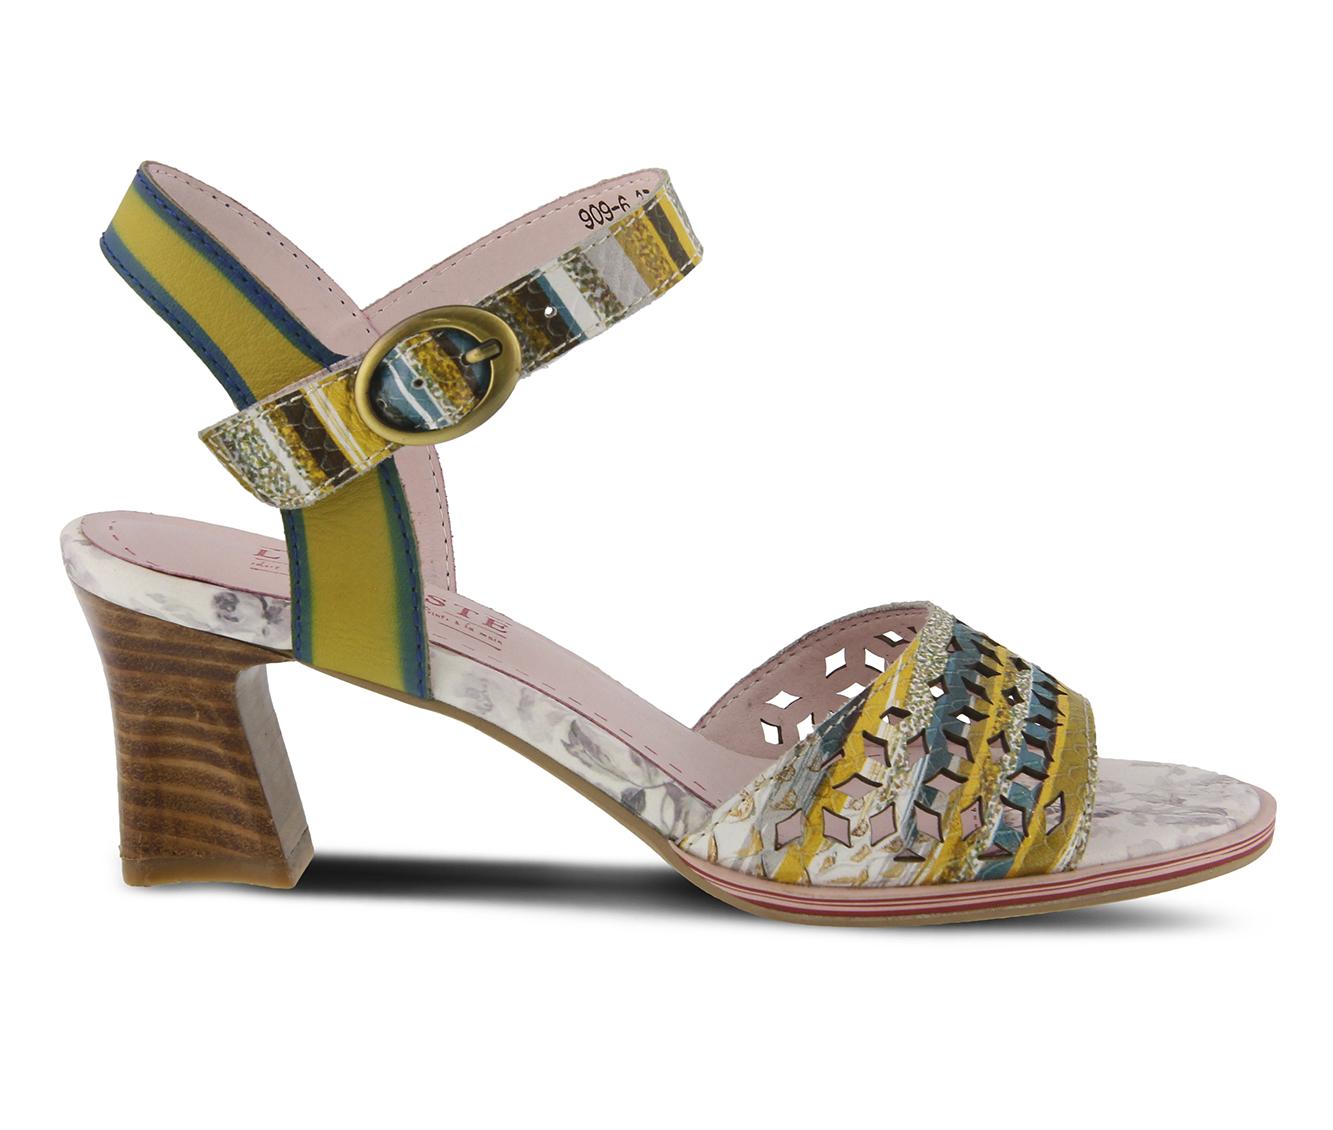 L'Artiste Madelyn Women's Dress Shoe (Yellow Leather)